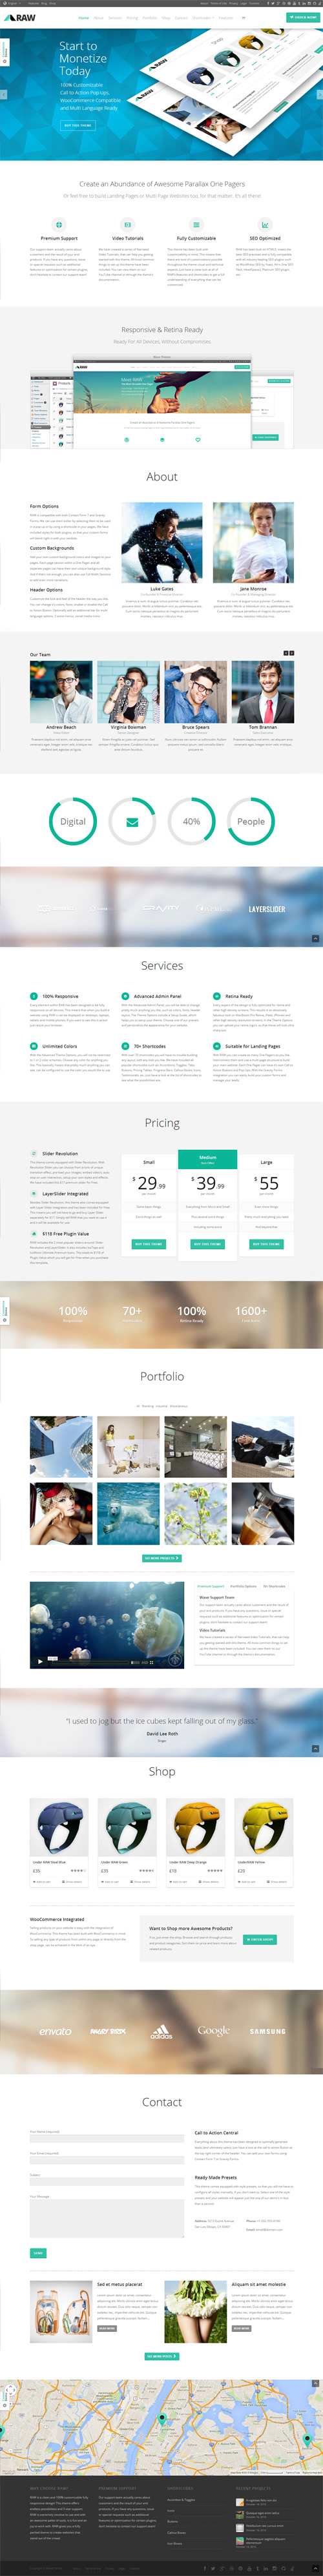 RAW - One Page Multi-Purpose WordPress Theme